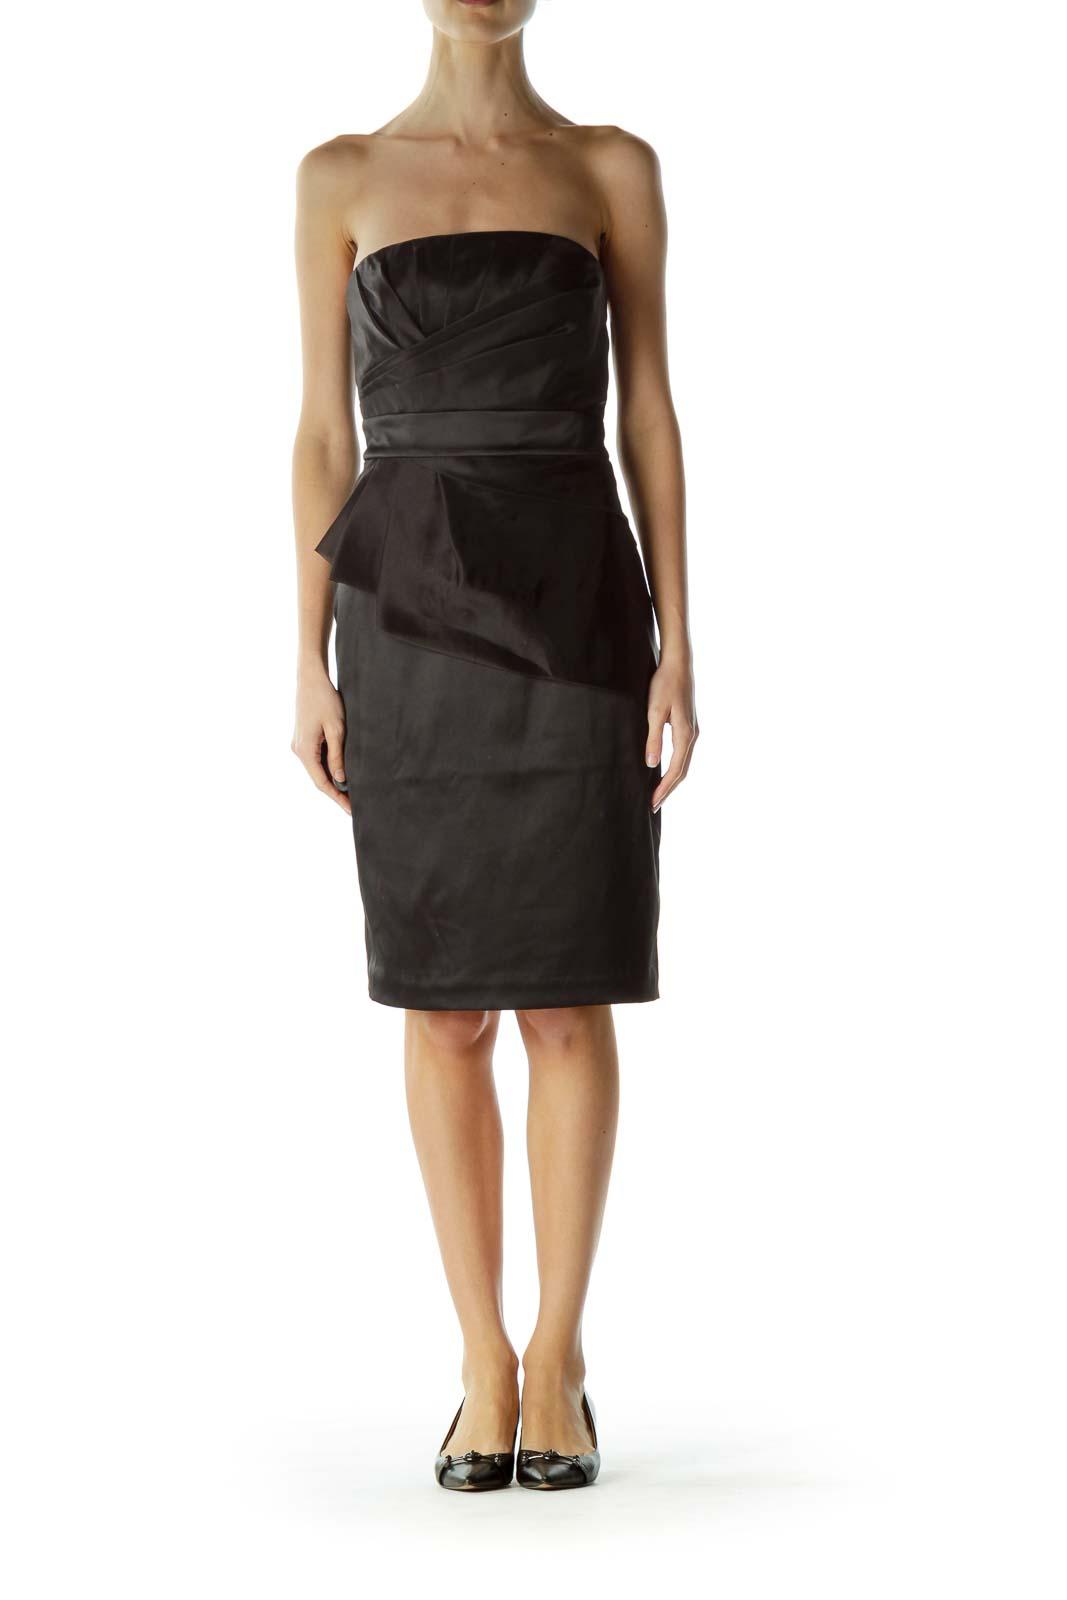 Black Strapless Shiny Cocktail Dress